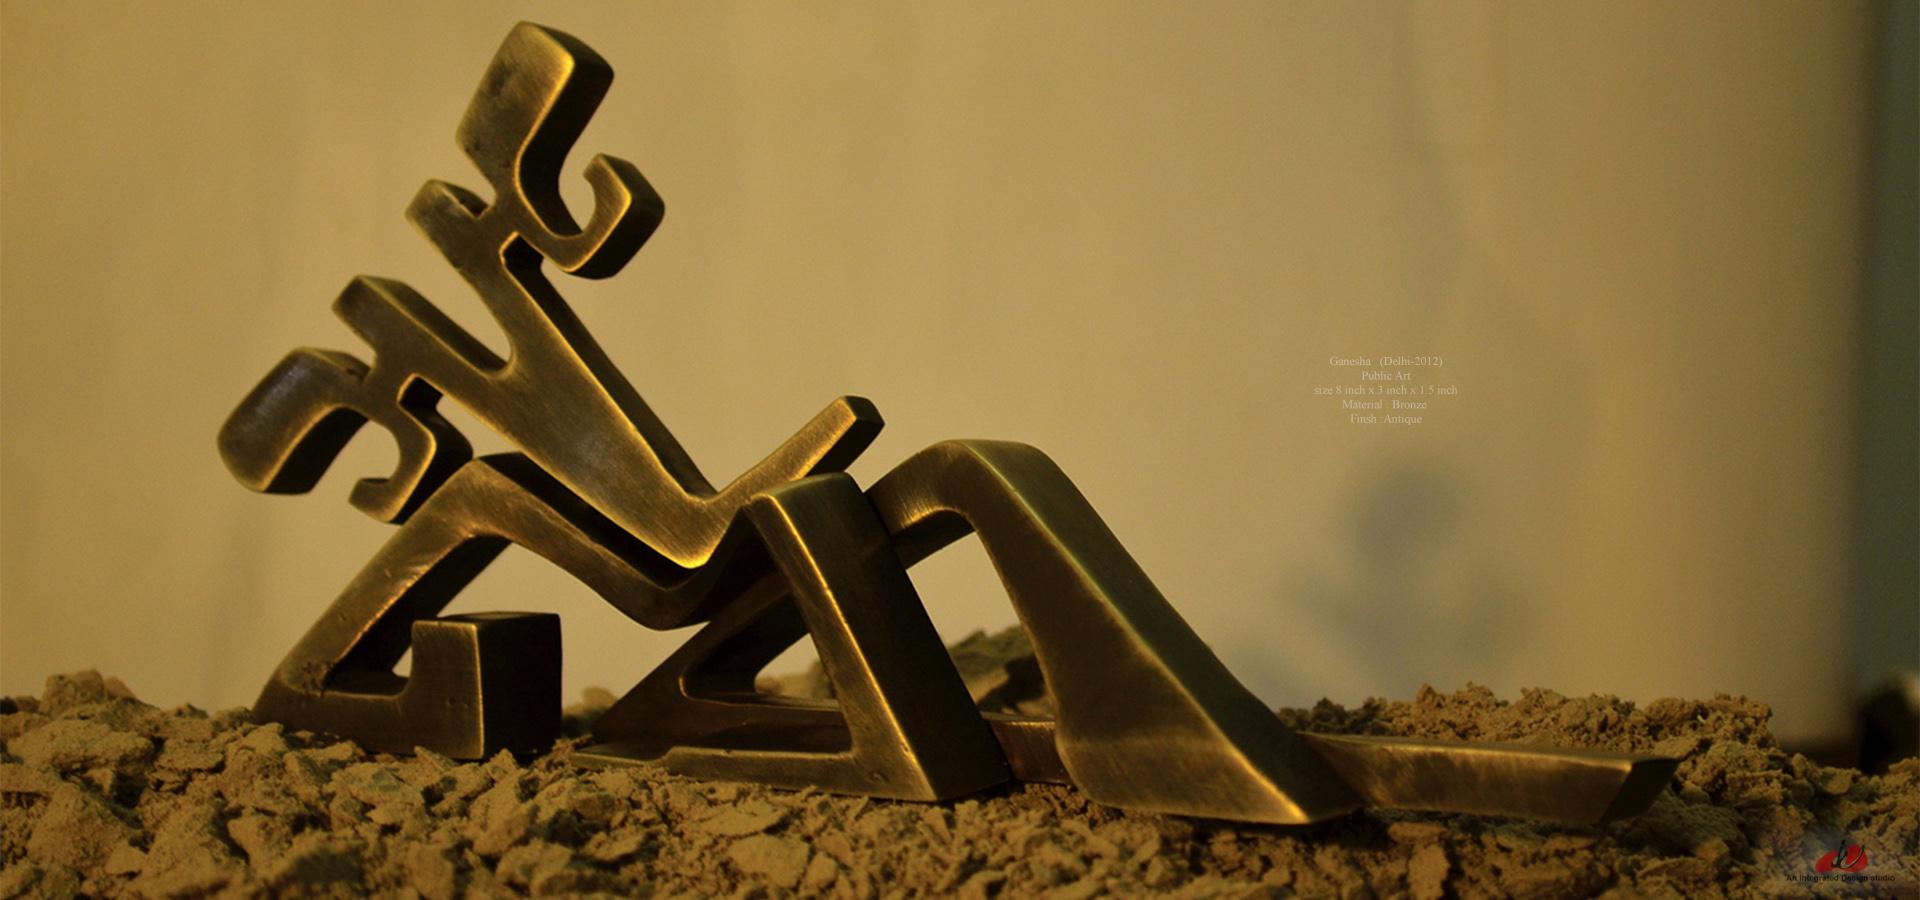 Ganesha Brass Sculpture